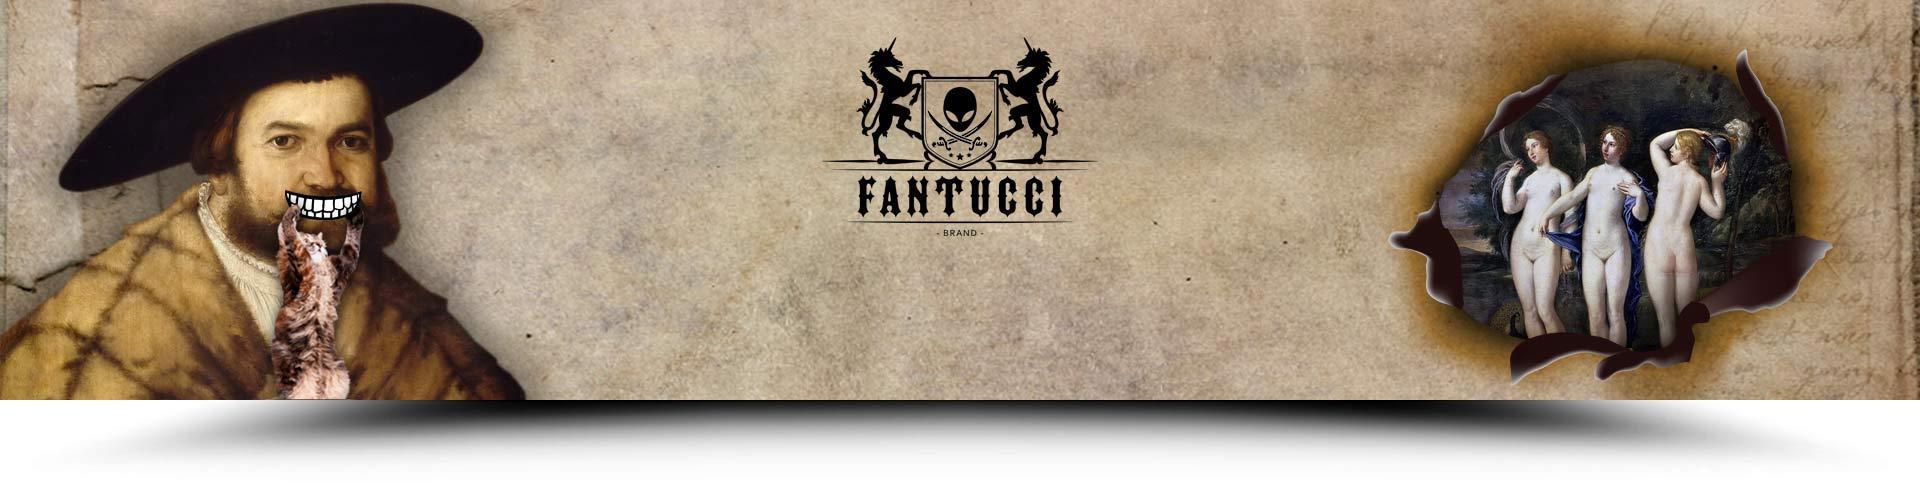 Fantucci Brand Slider 2